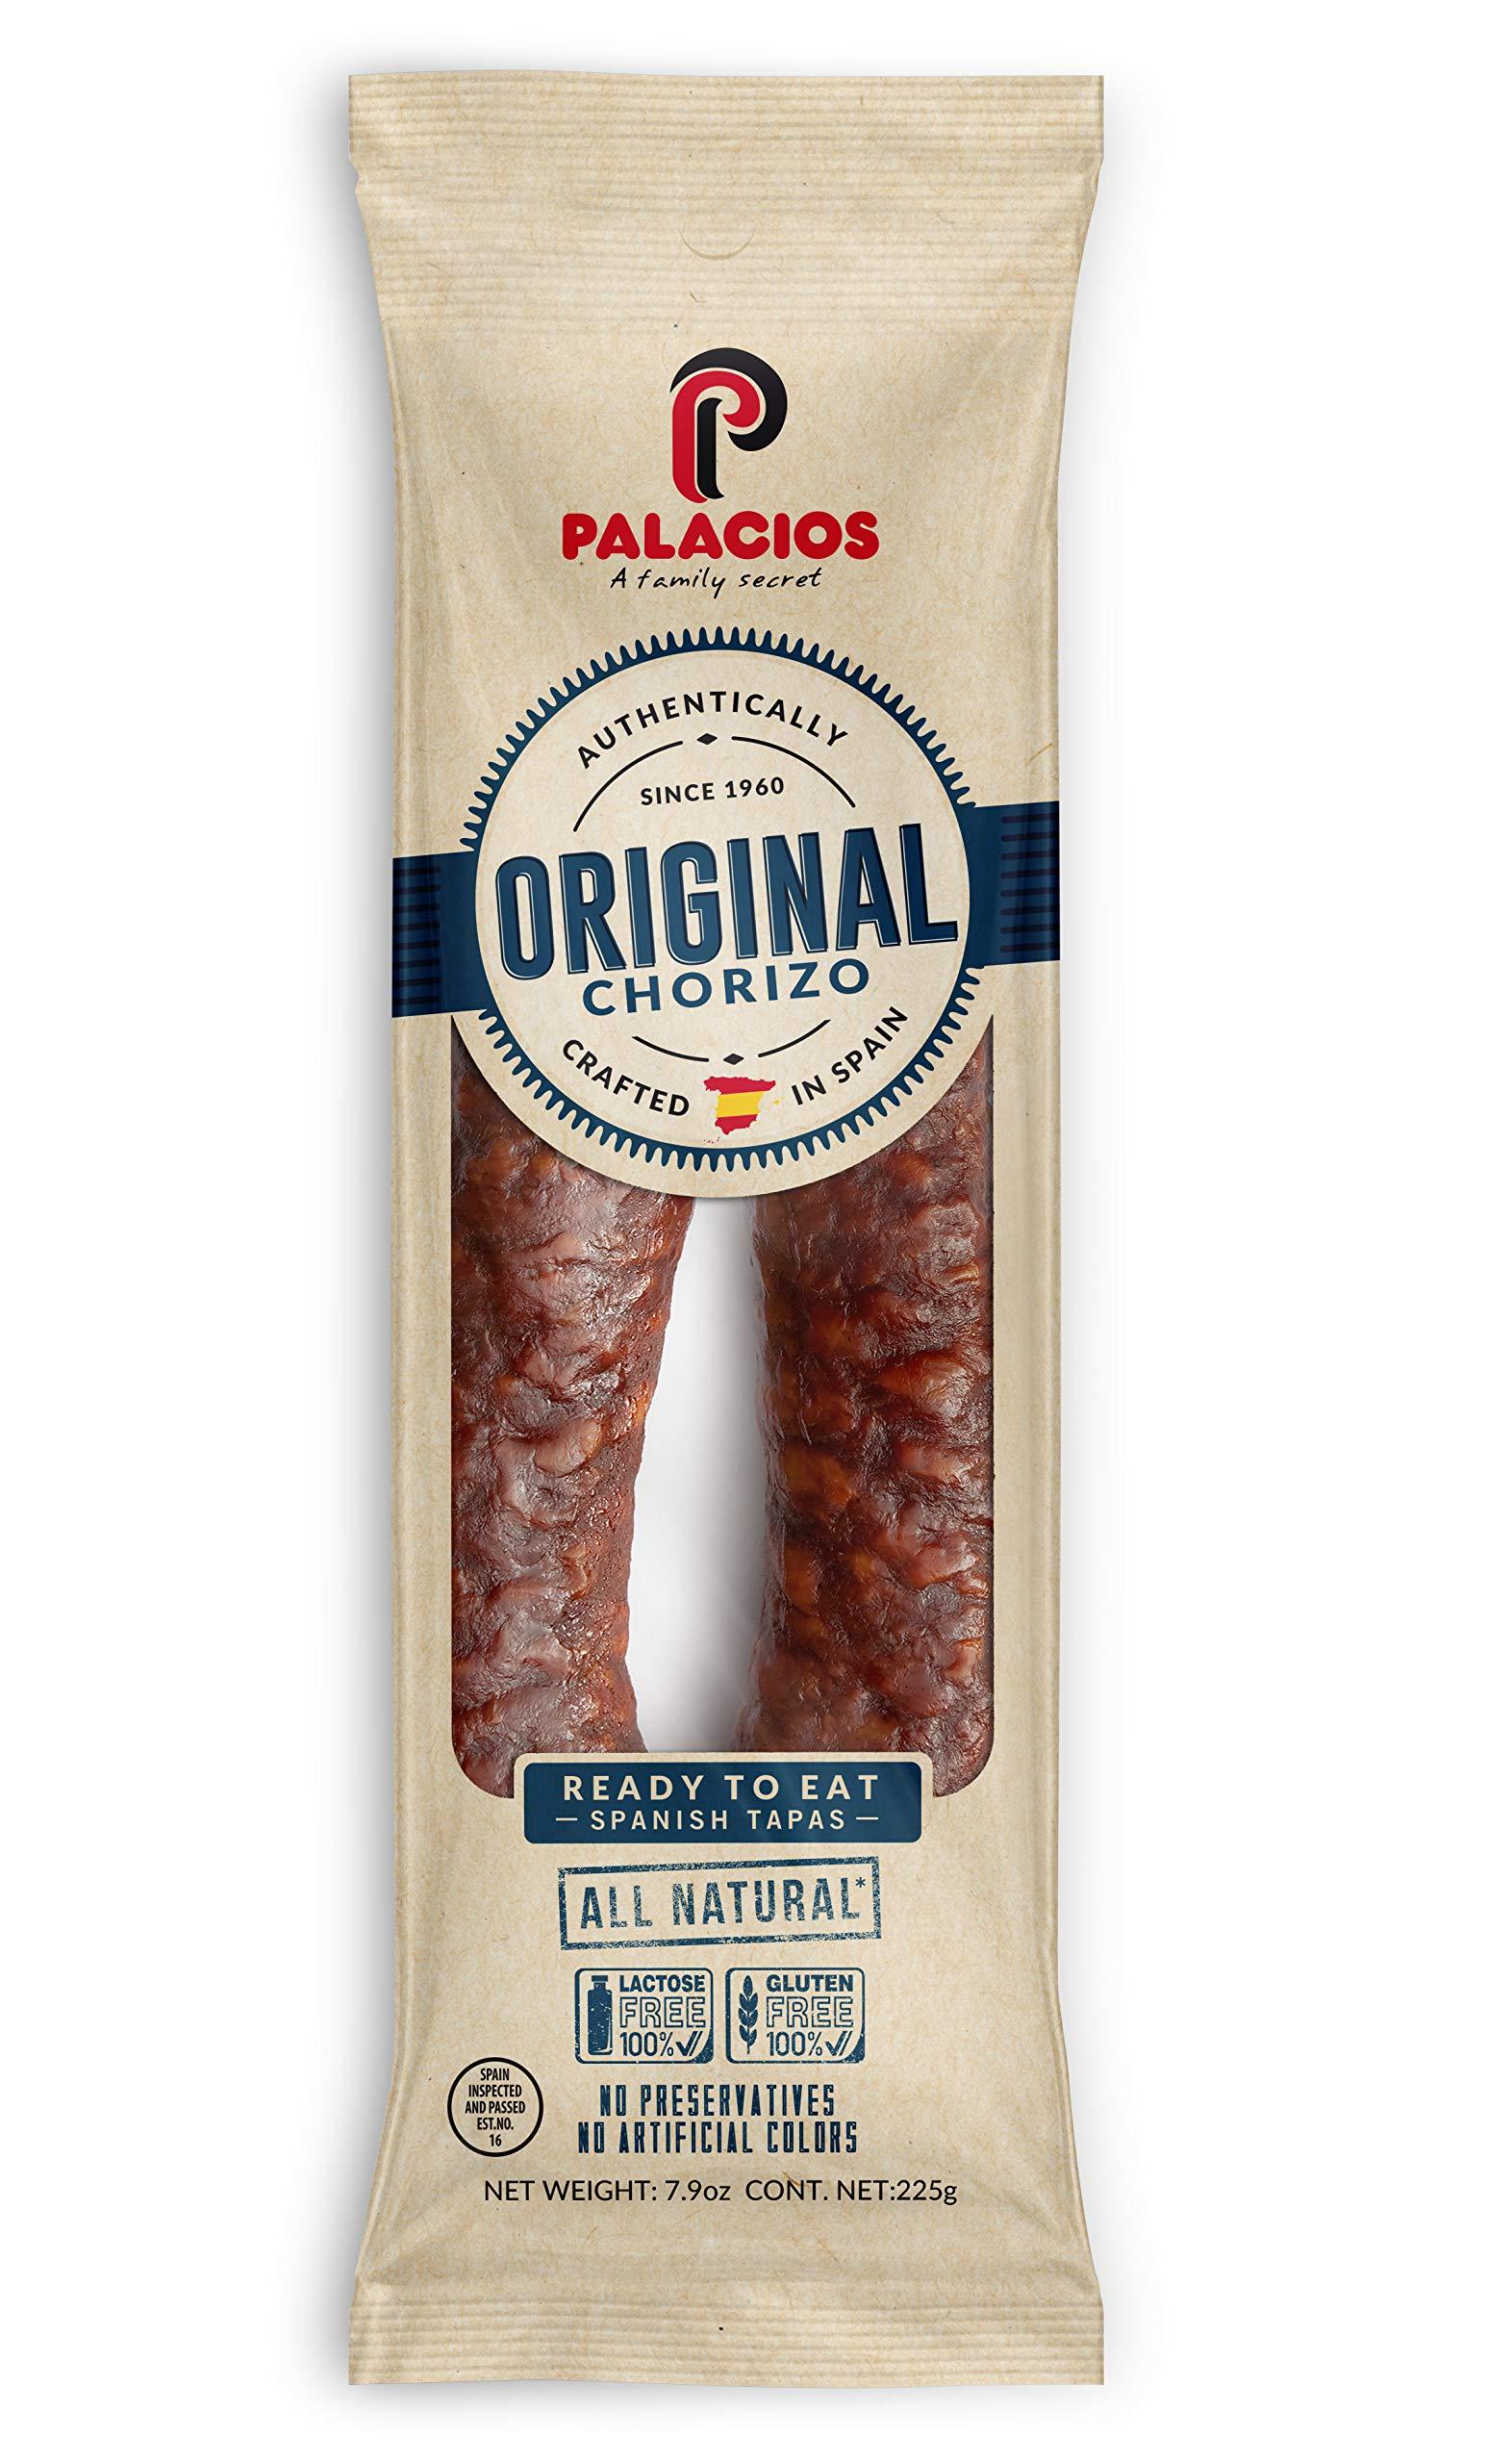 Palacios Spanish Hot Picante Chorizo 7.9 Ounce.: Amazon.com: Grocery ...